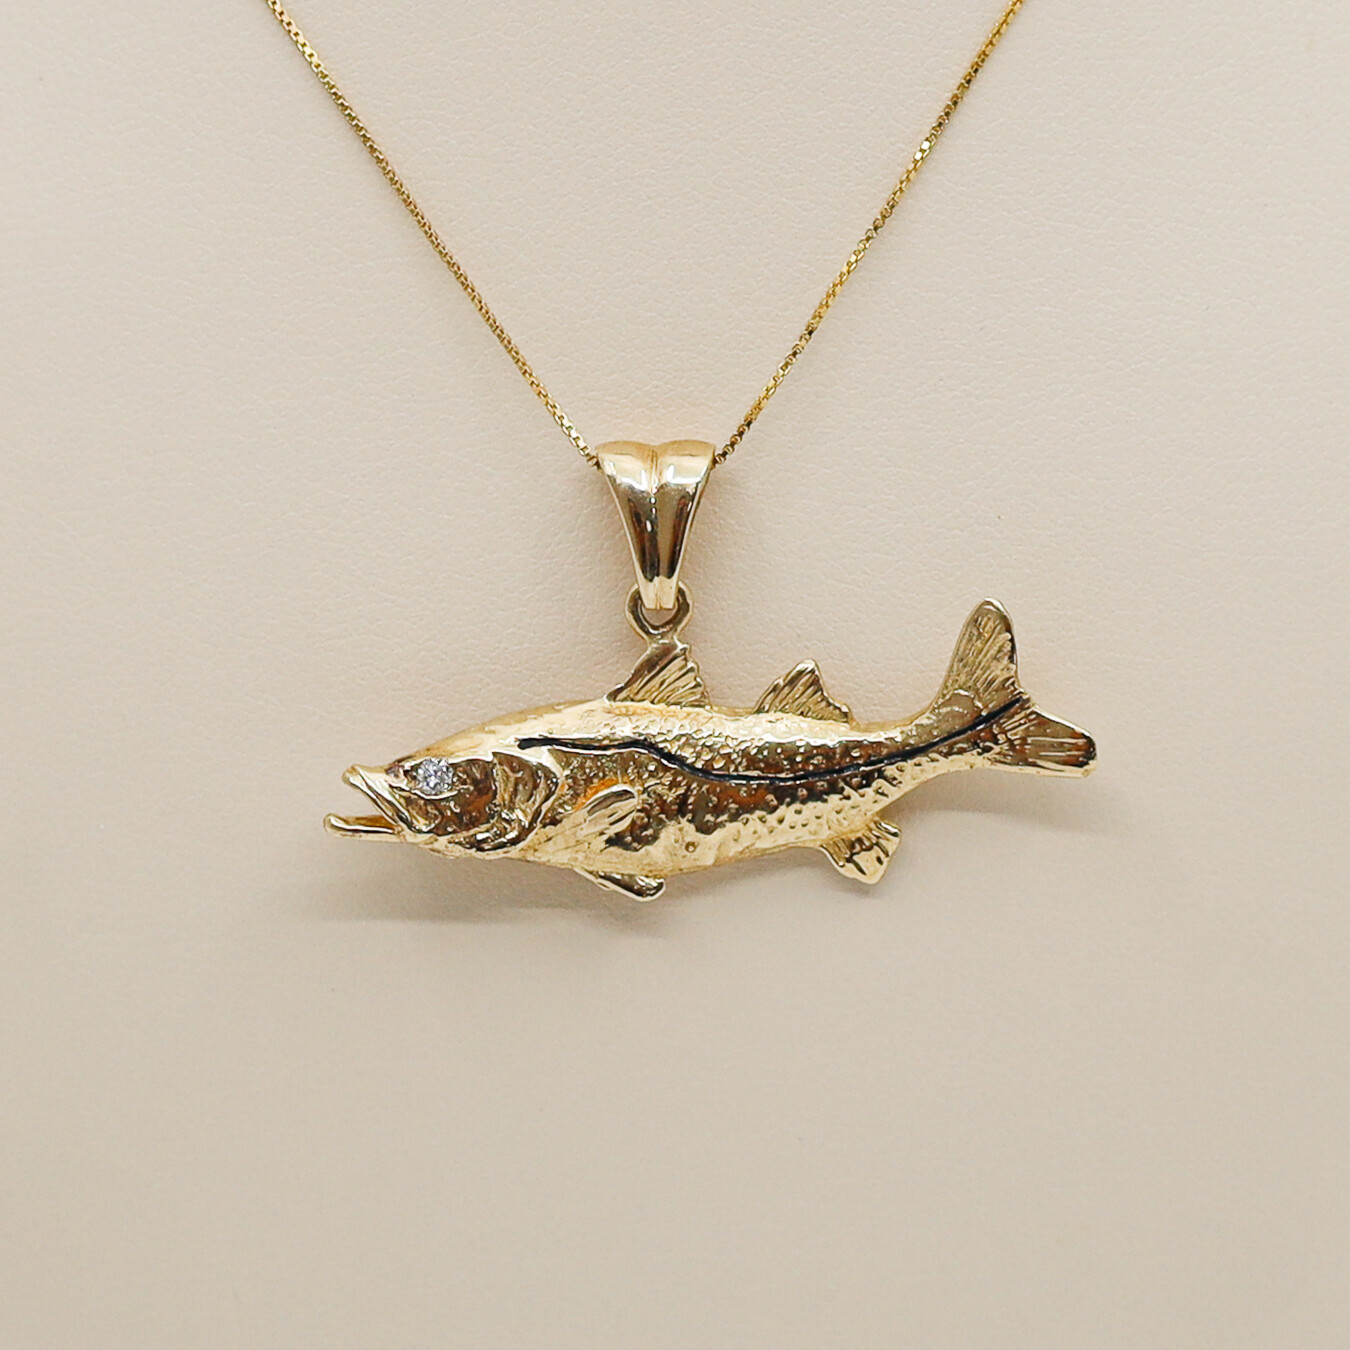 Snook Fish Pendant with Diamond